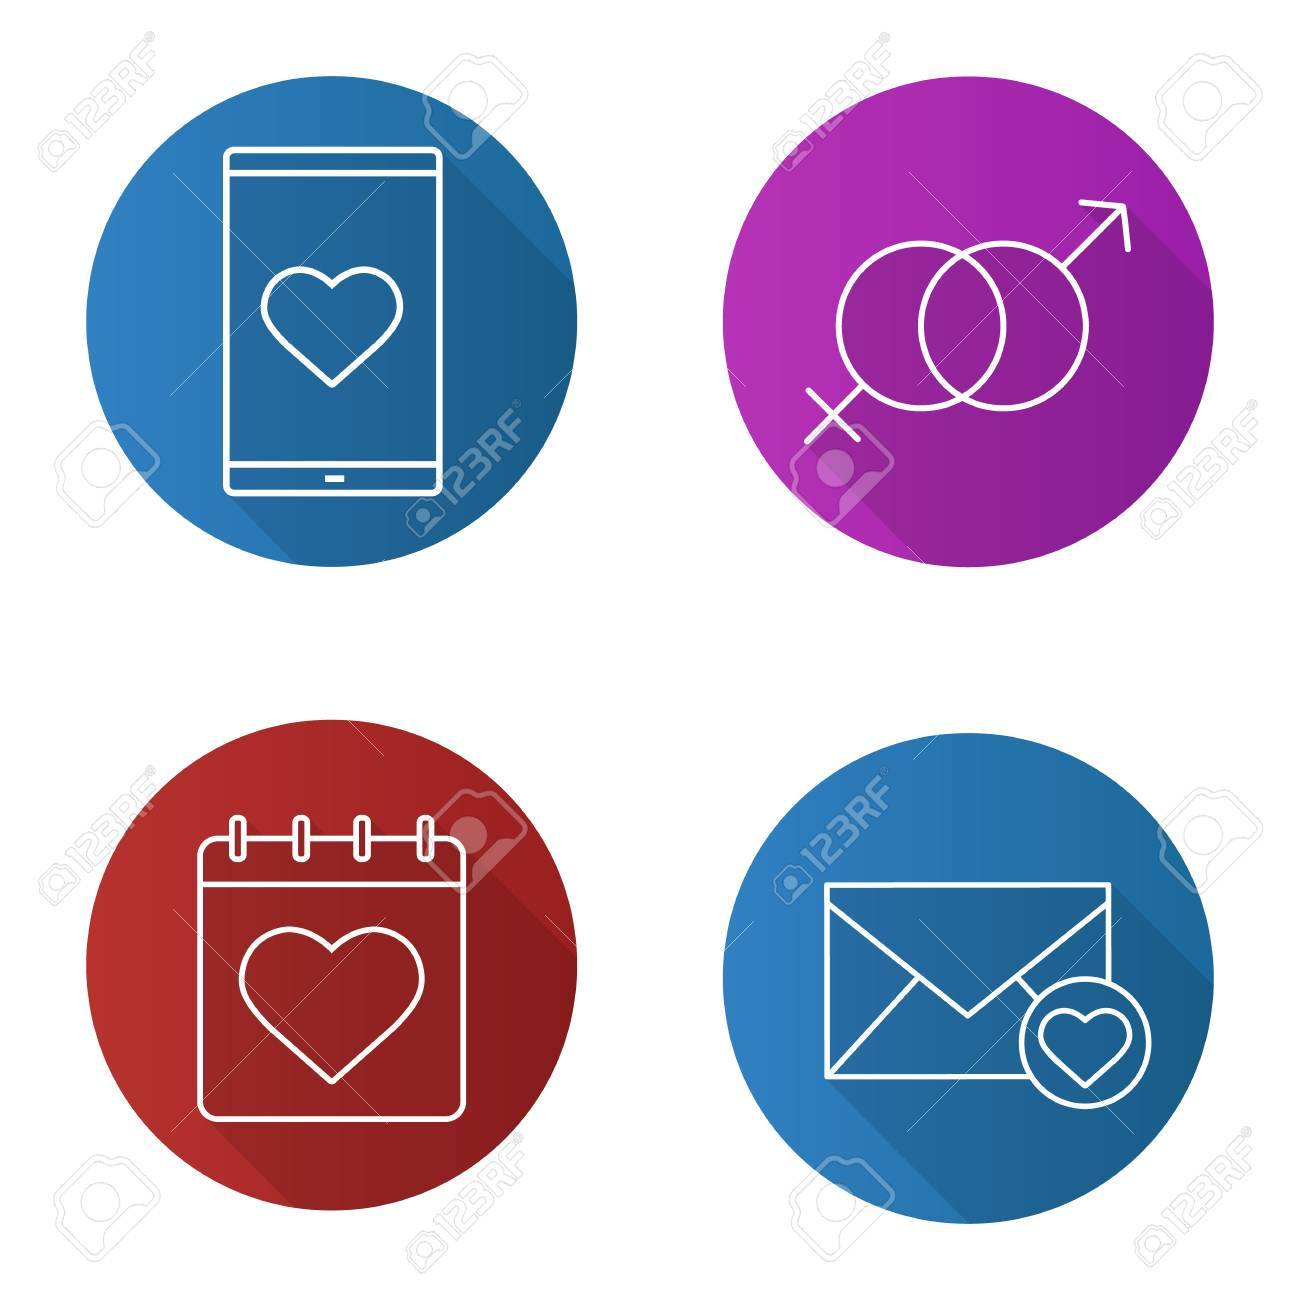 bedste dating chat online